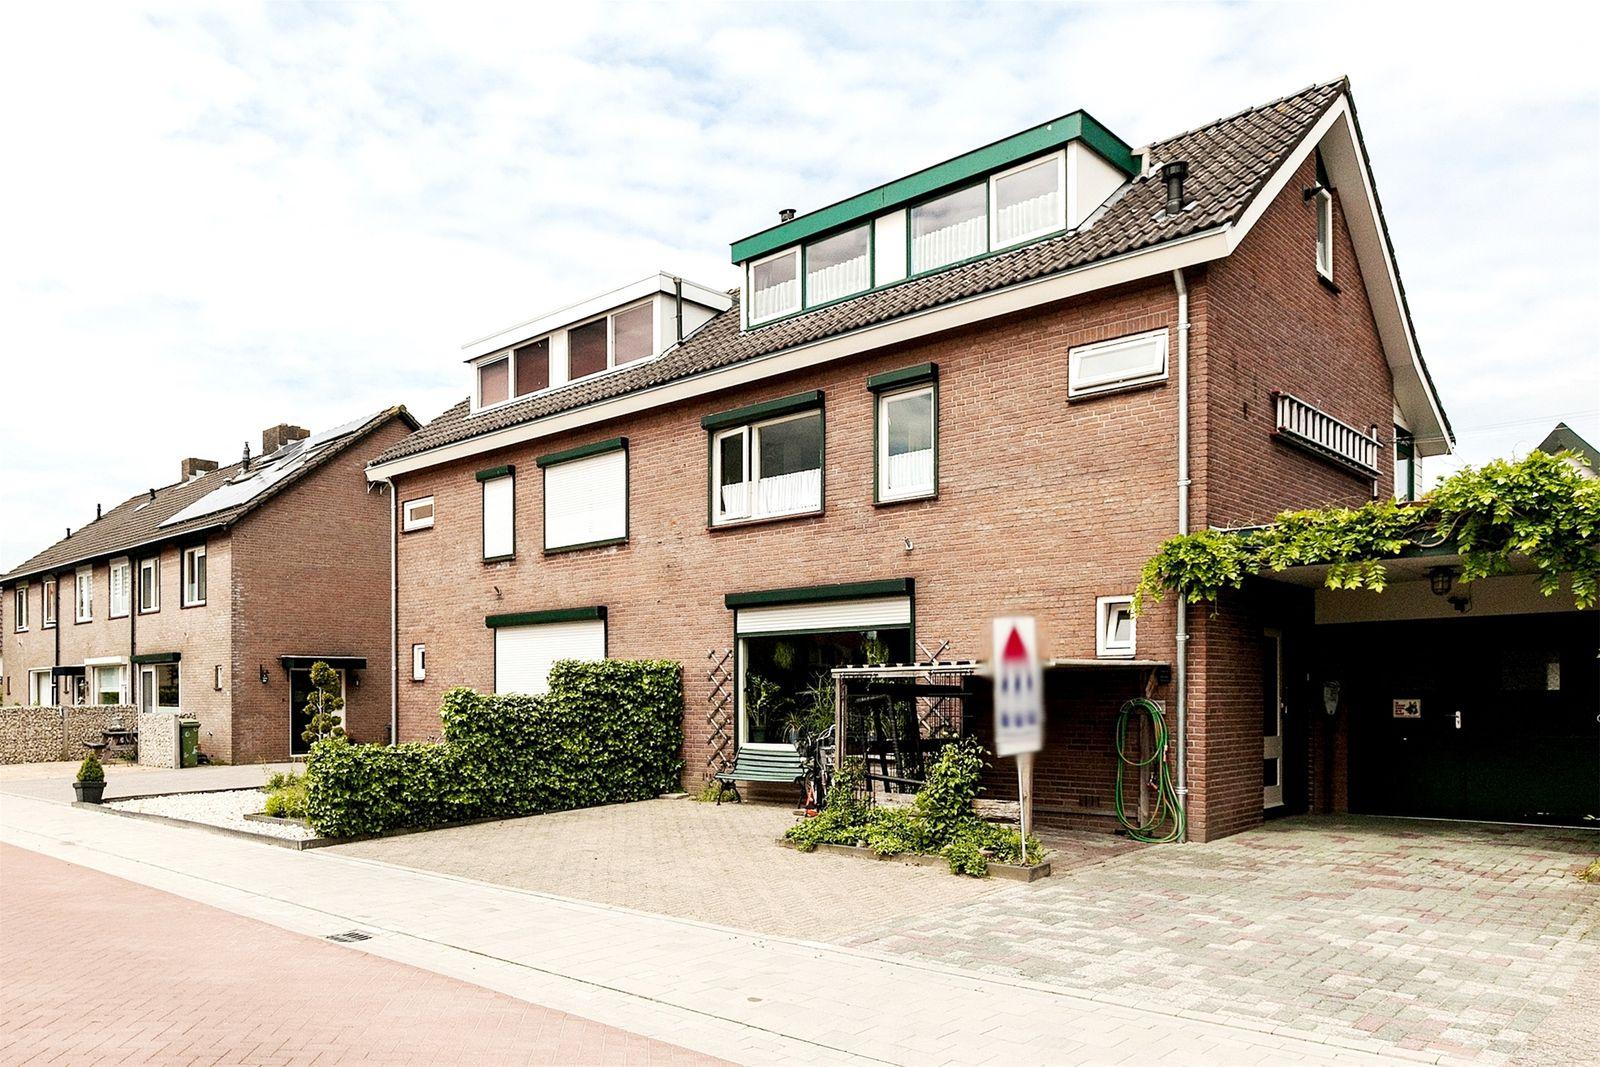 Koningin Julianastraat 20, Randwijk